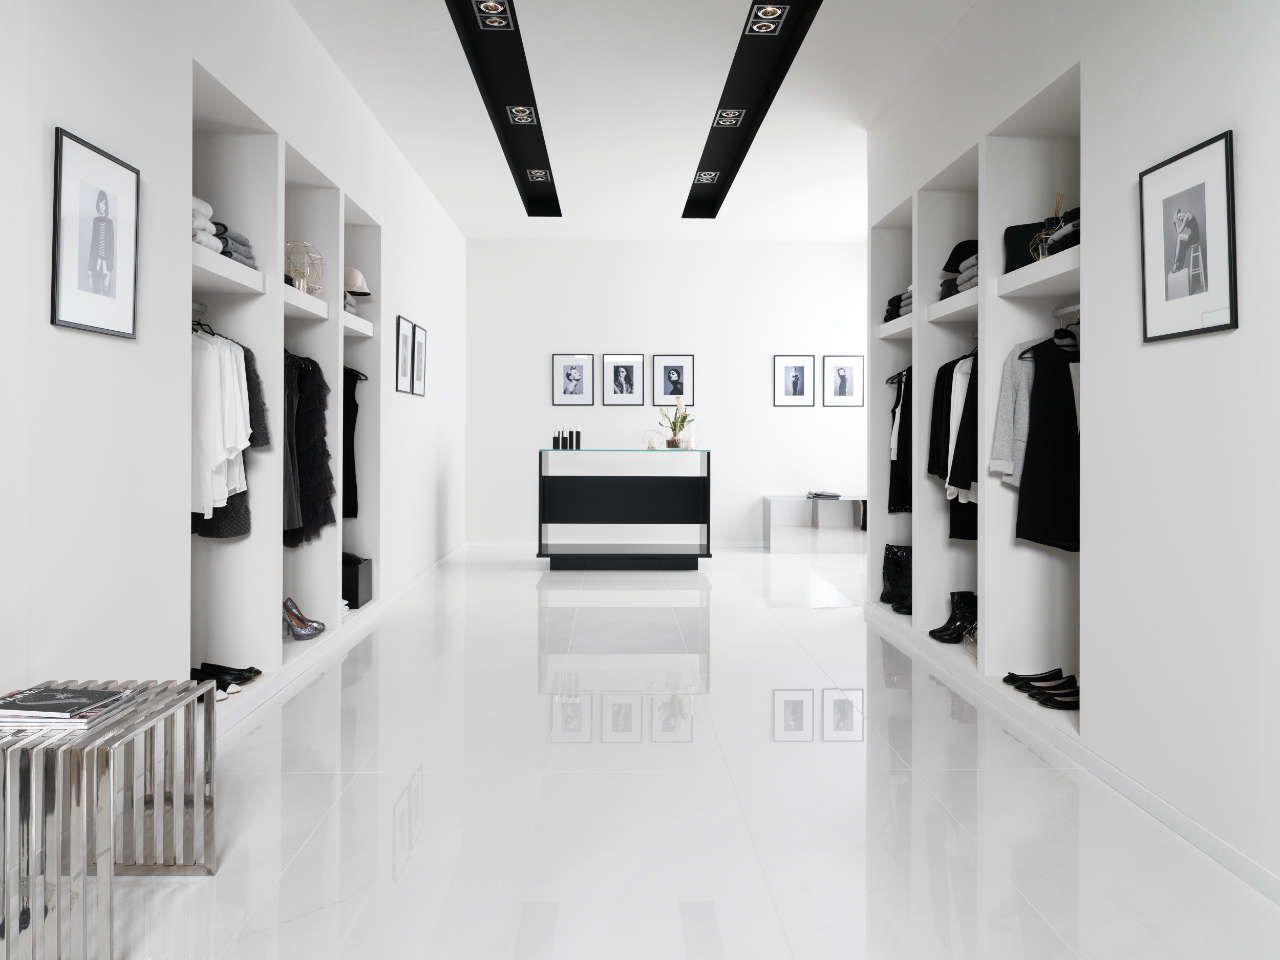 Pavimento gres porcel nico pure white polished 60x120 cm for Poli arredamenti